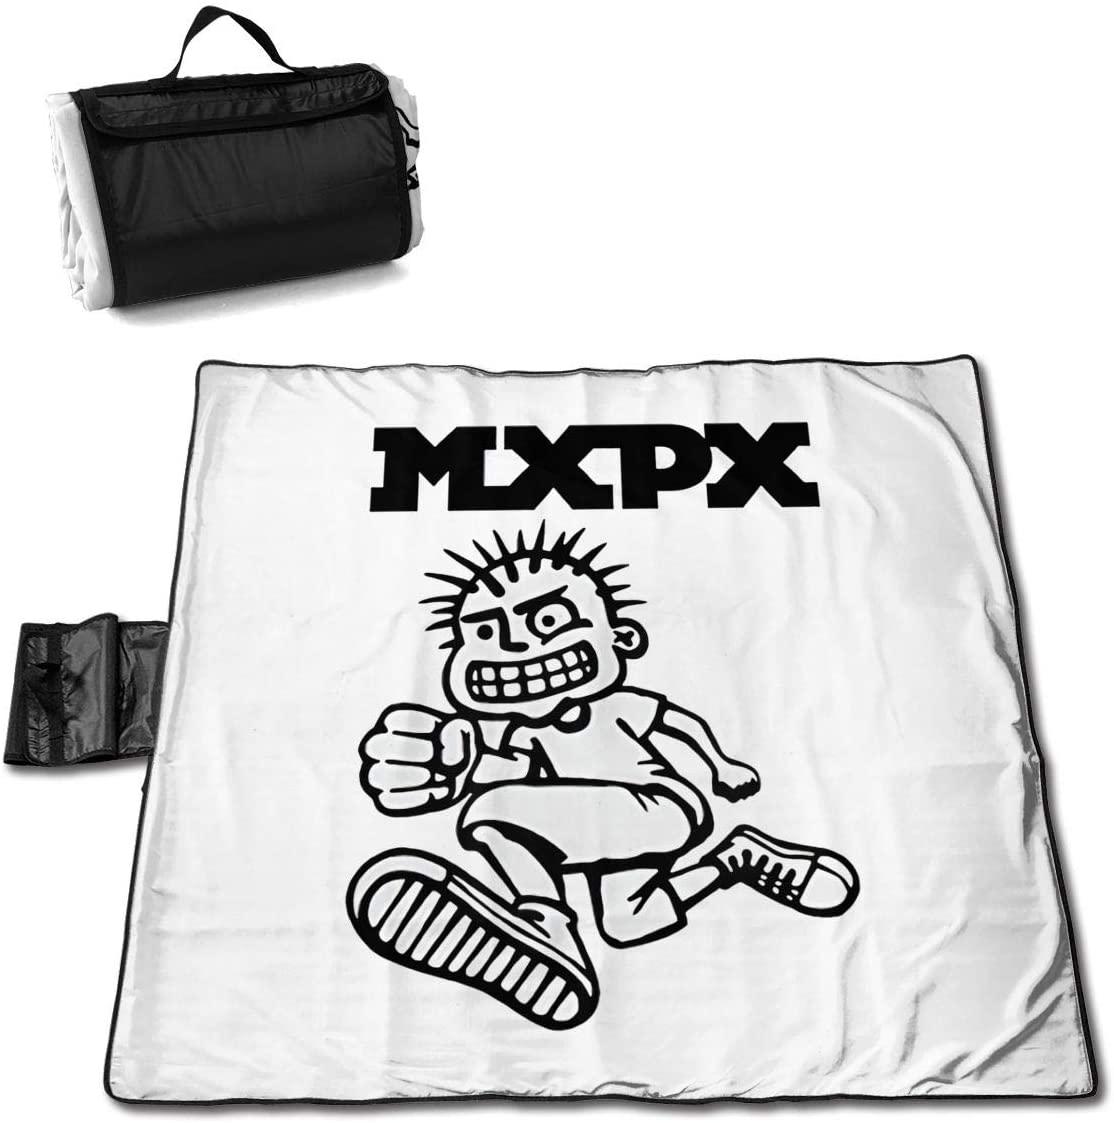 Htu Mx-Px Funny Portable Printed Picnic Blanket Waterproof 59x57(in)